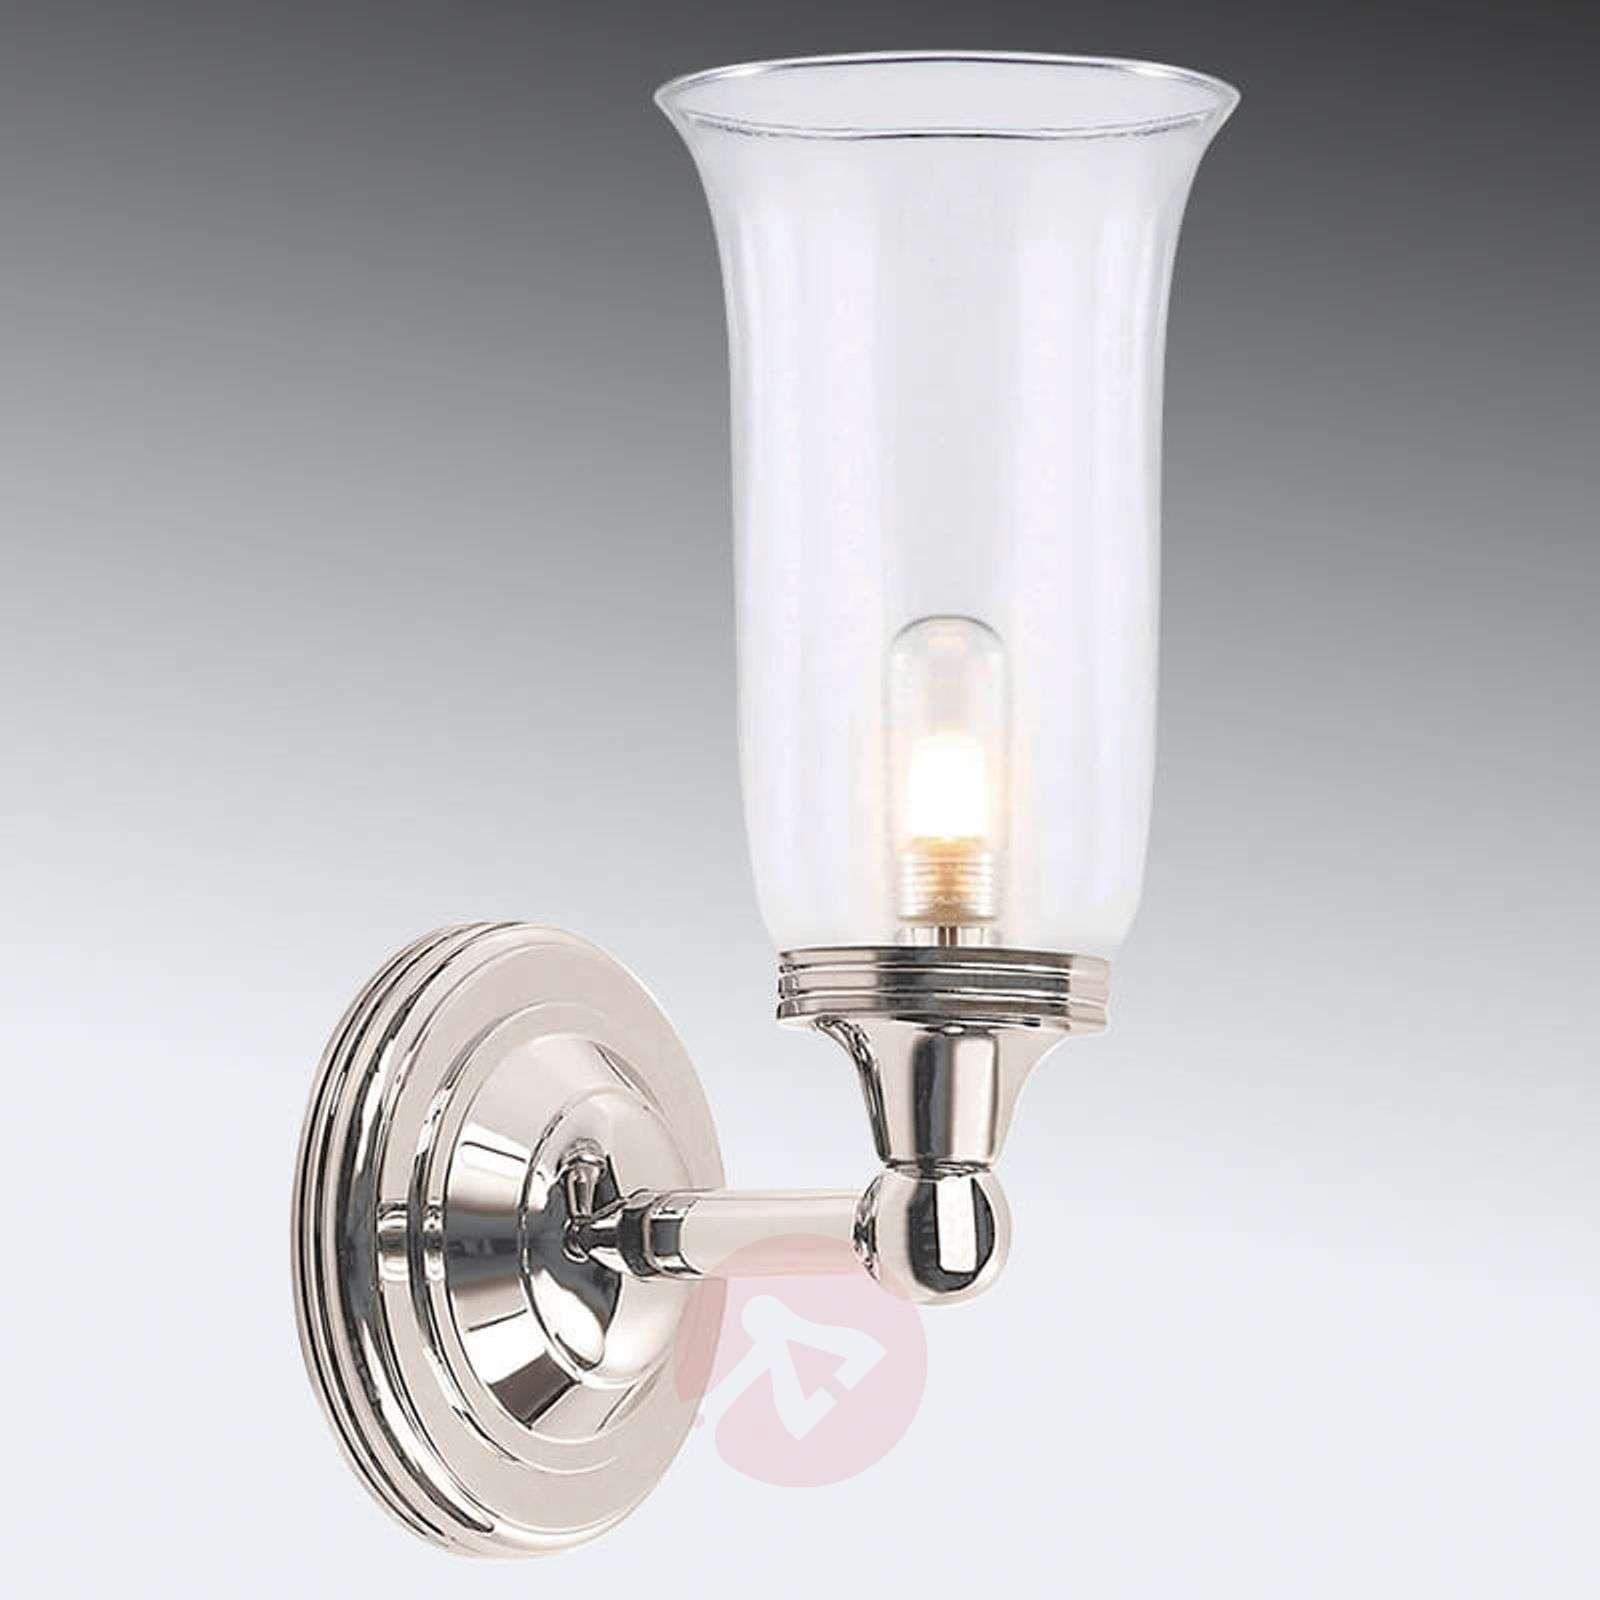 Smooth glass bathroom wall light Austen 2 nickel-3048660-01